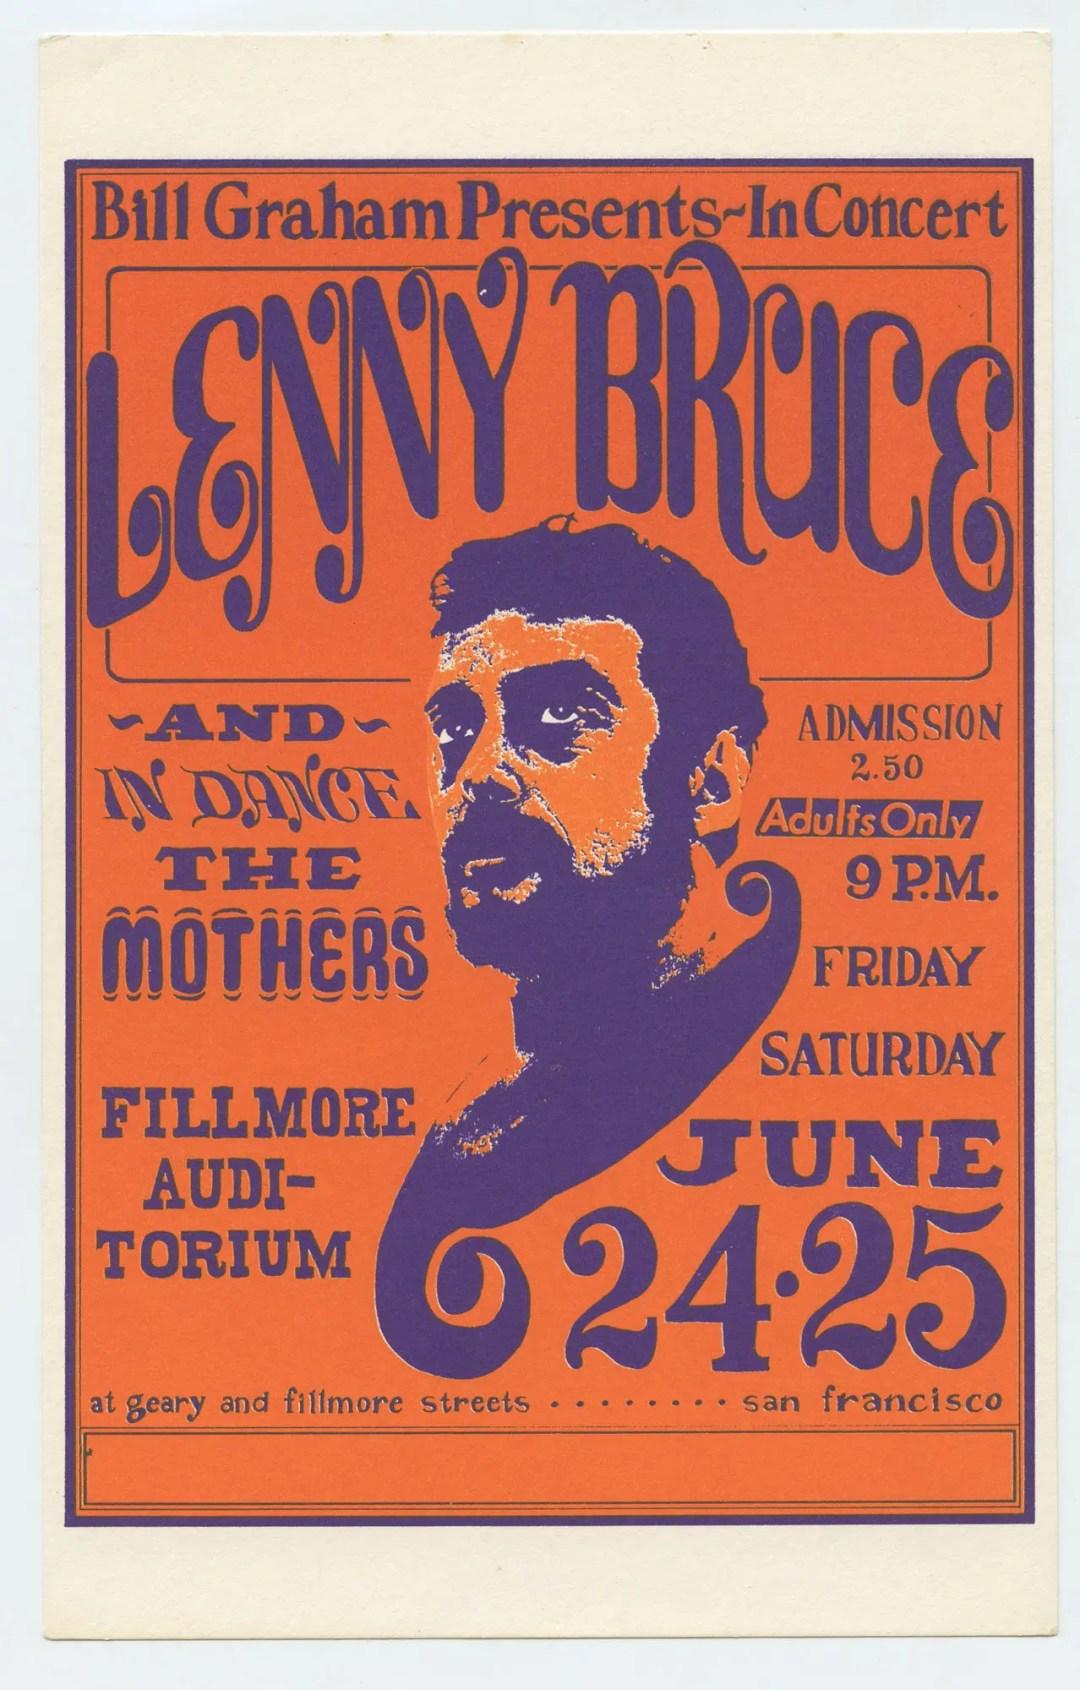 BG 13 Postcard Lenny Bruce The Mothers 1966 Jun 24